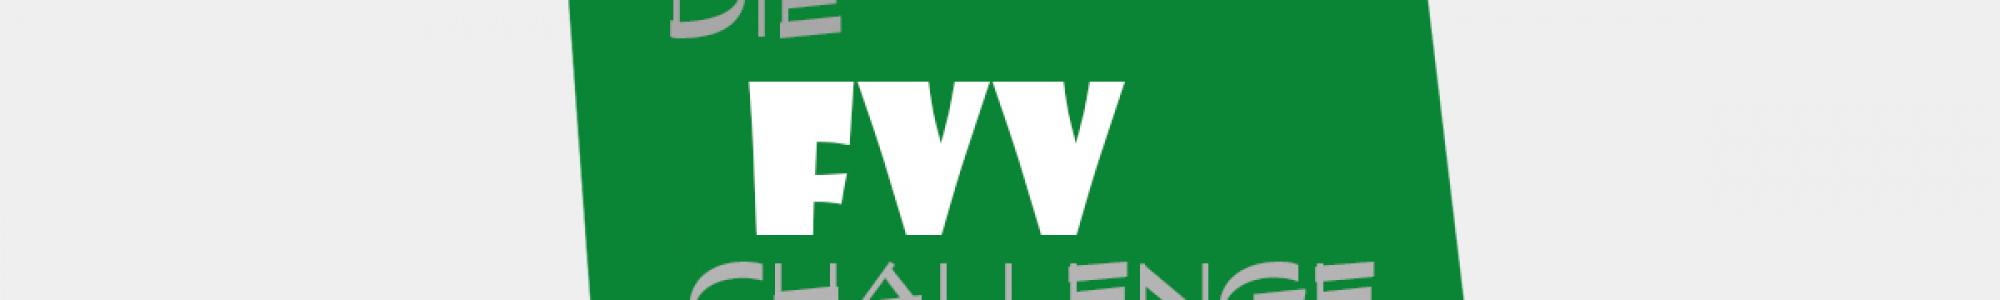 FVV Challenge